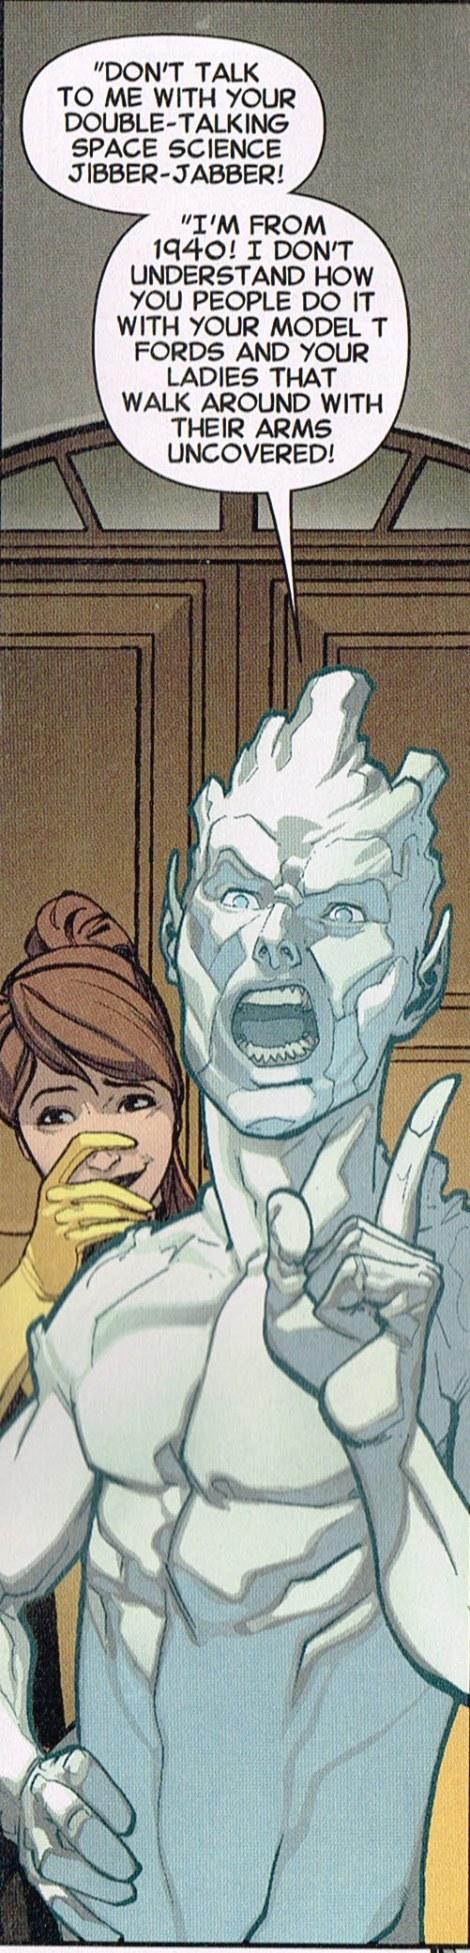 iceman_comics